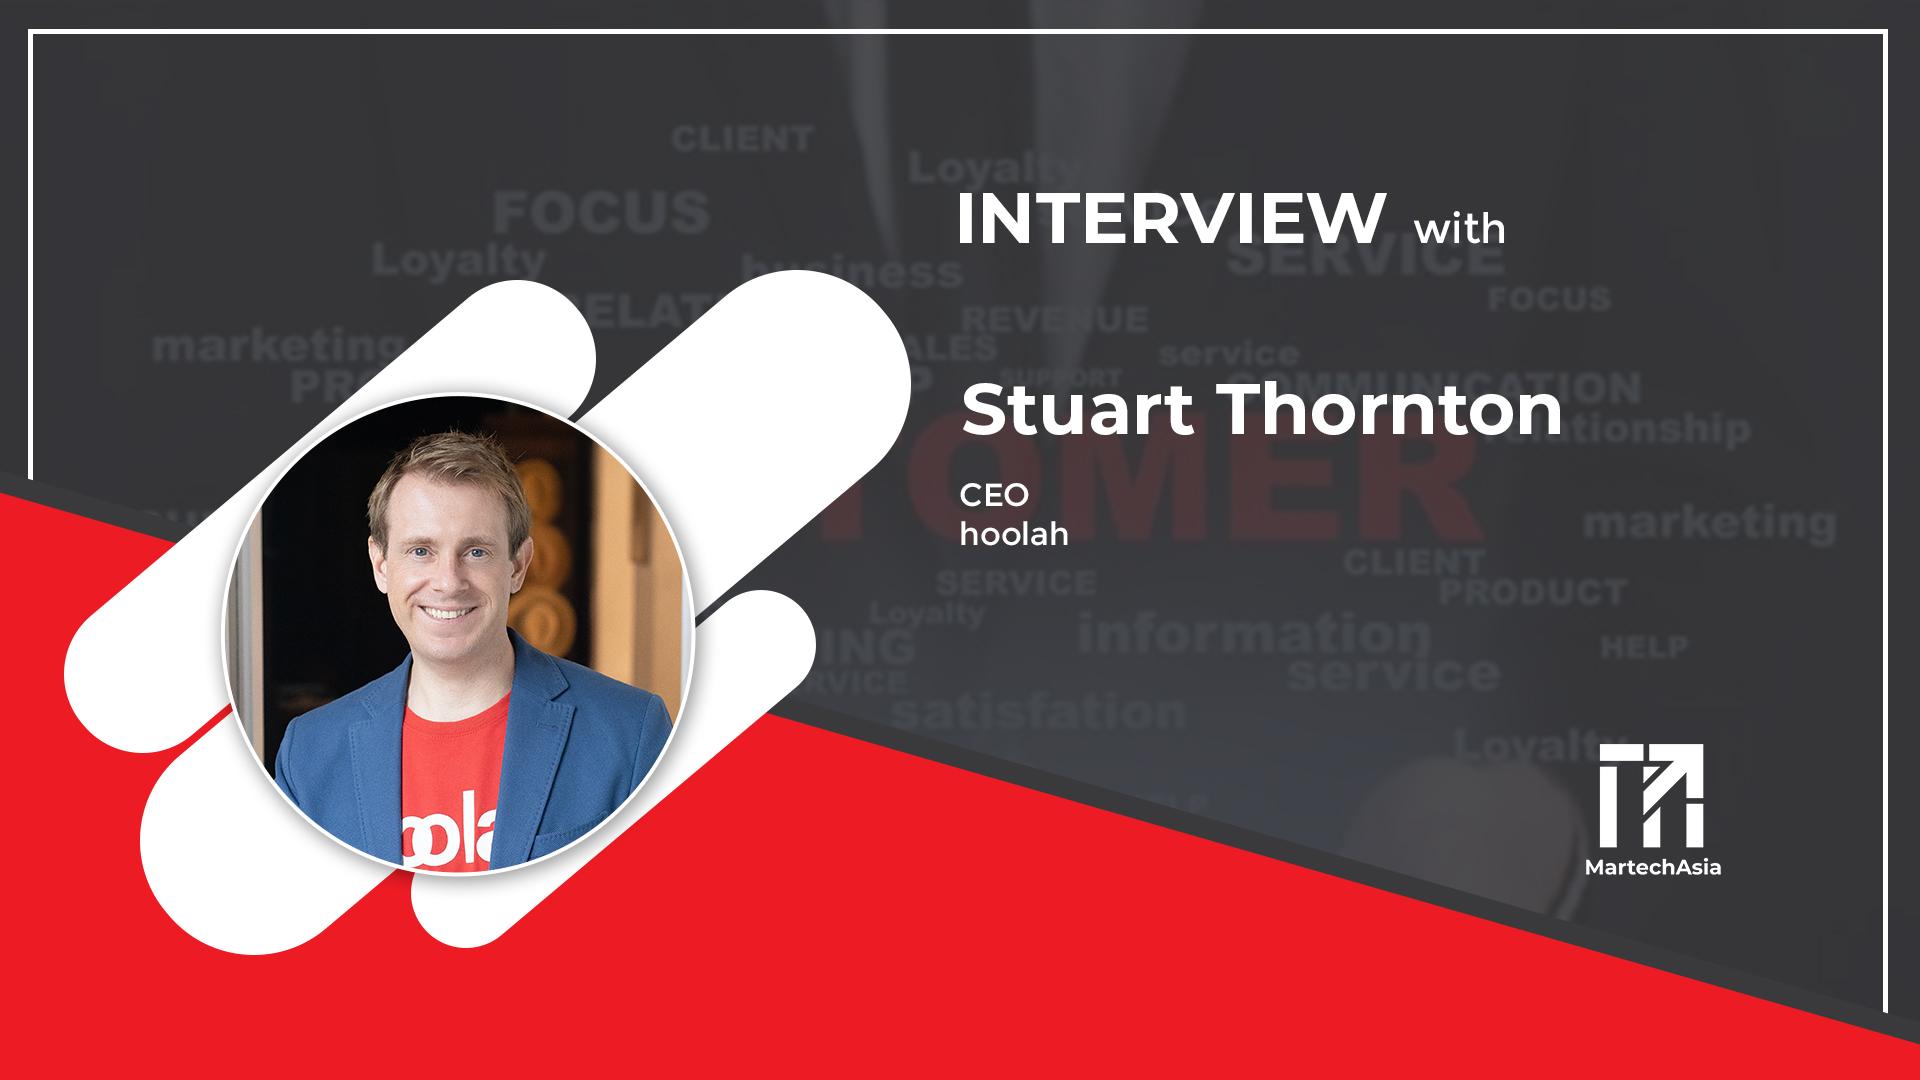 Customer obsession is key: Stuart Thornton, CEO of hoolah